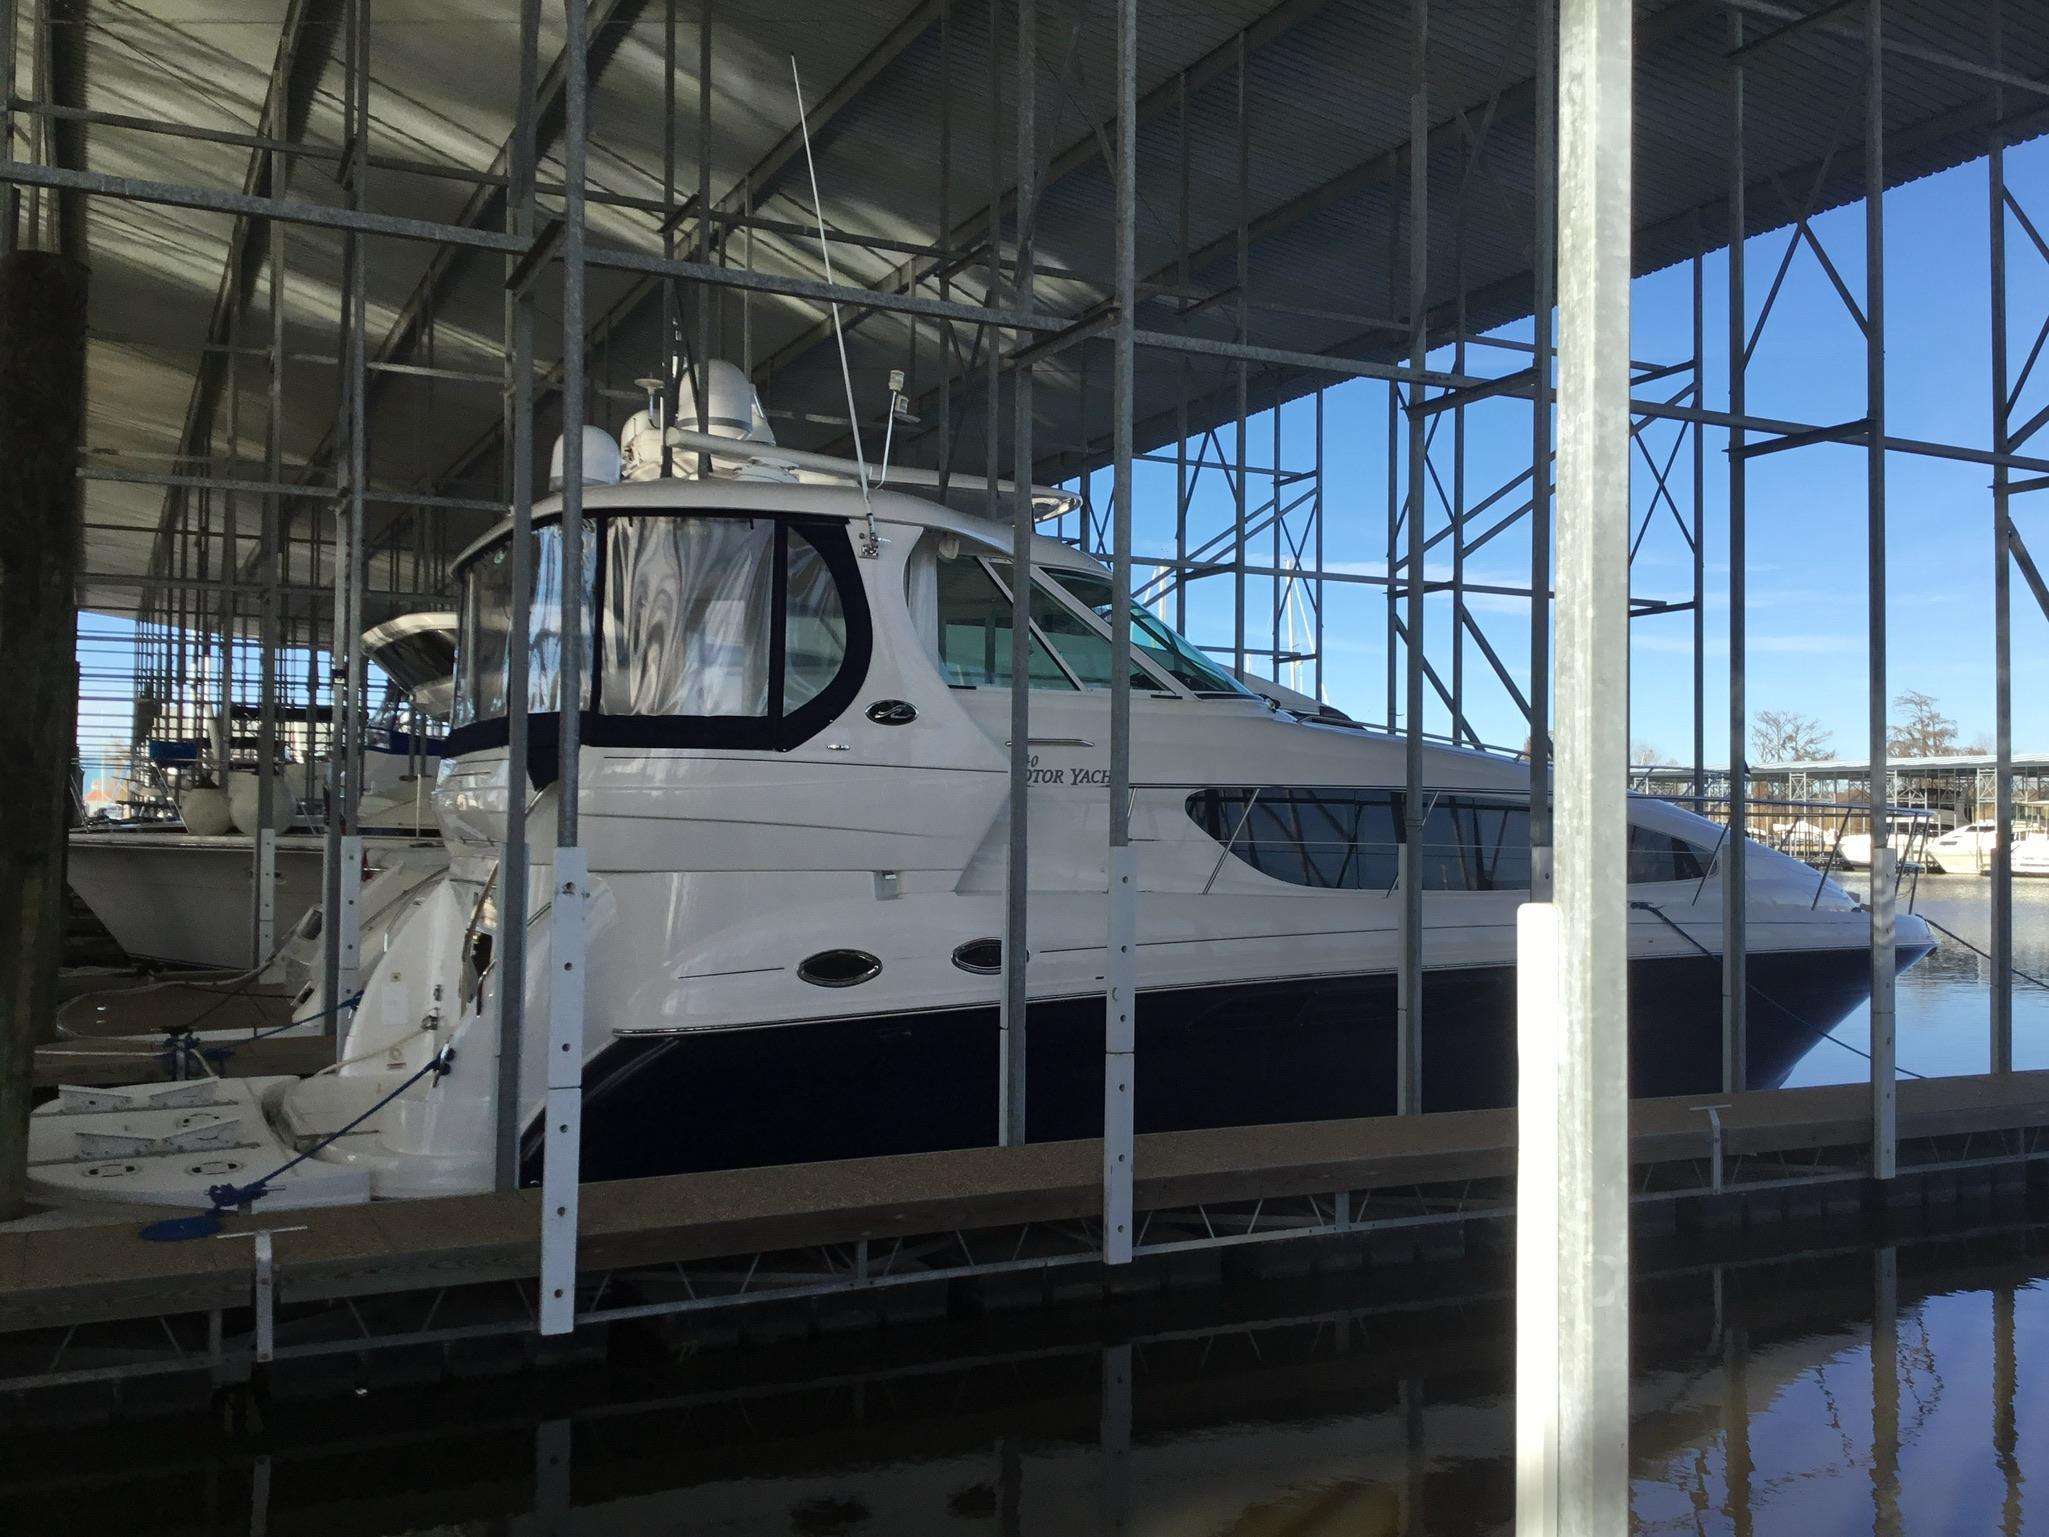 Sea Ray 40 Motor Yacht In-Slip